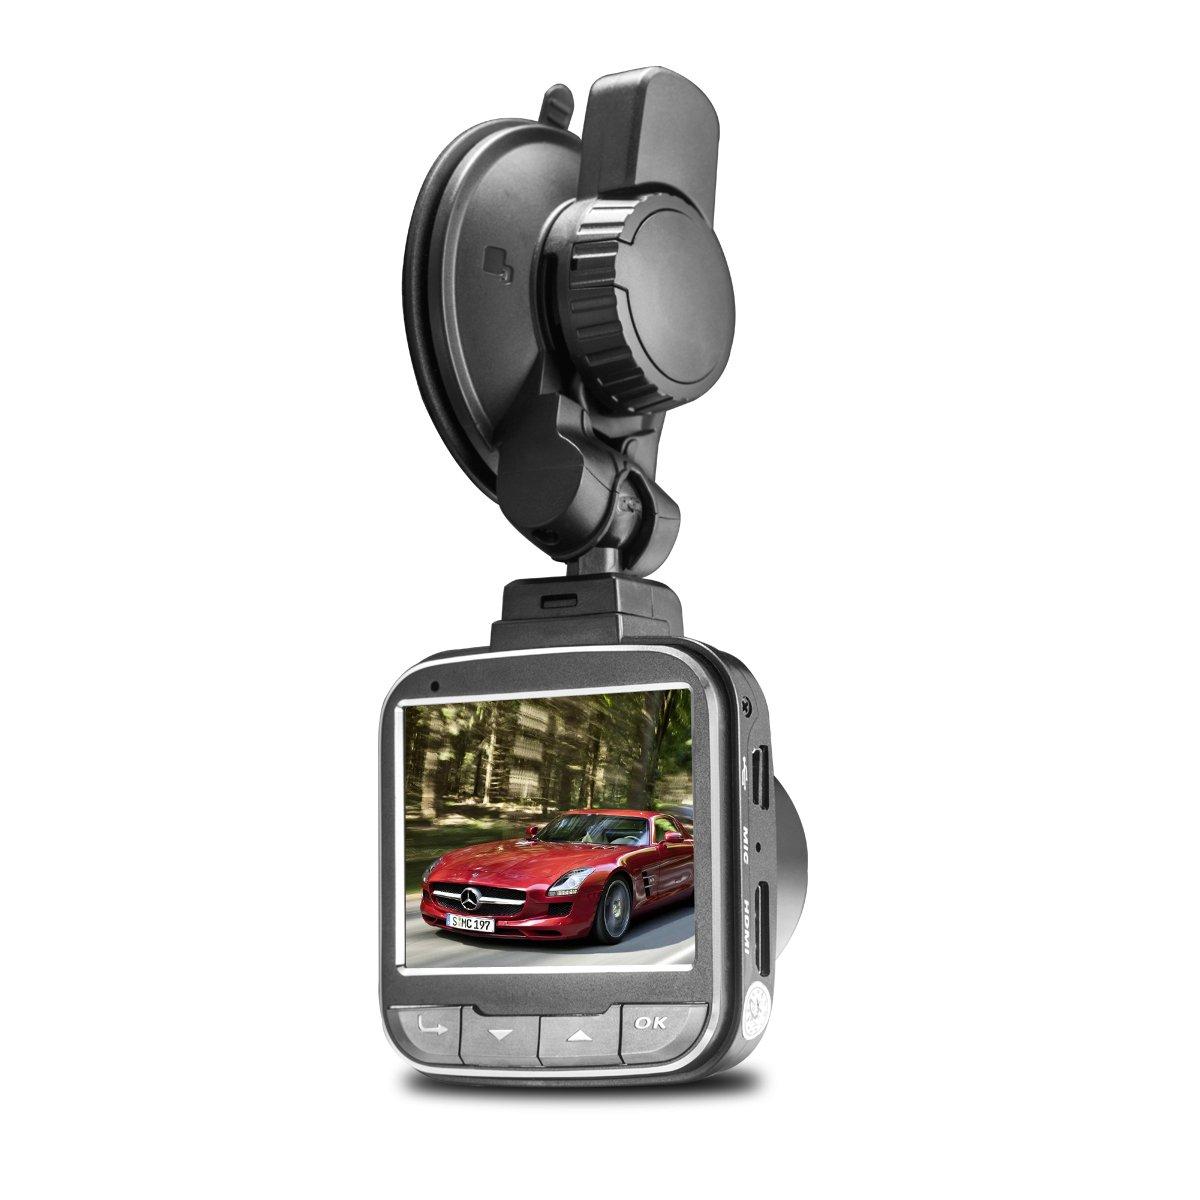 Loop Recording Driving Recorder with 3 LCD Screen Kamuue Dash Cam 1080P Full HD Car DVR Dashboard Camera G-Sensor Motion Detection WDR Driving Recorder with 3 LCD Screen